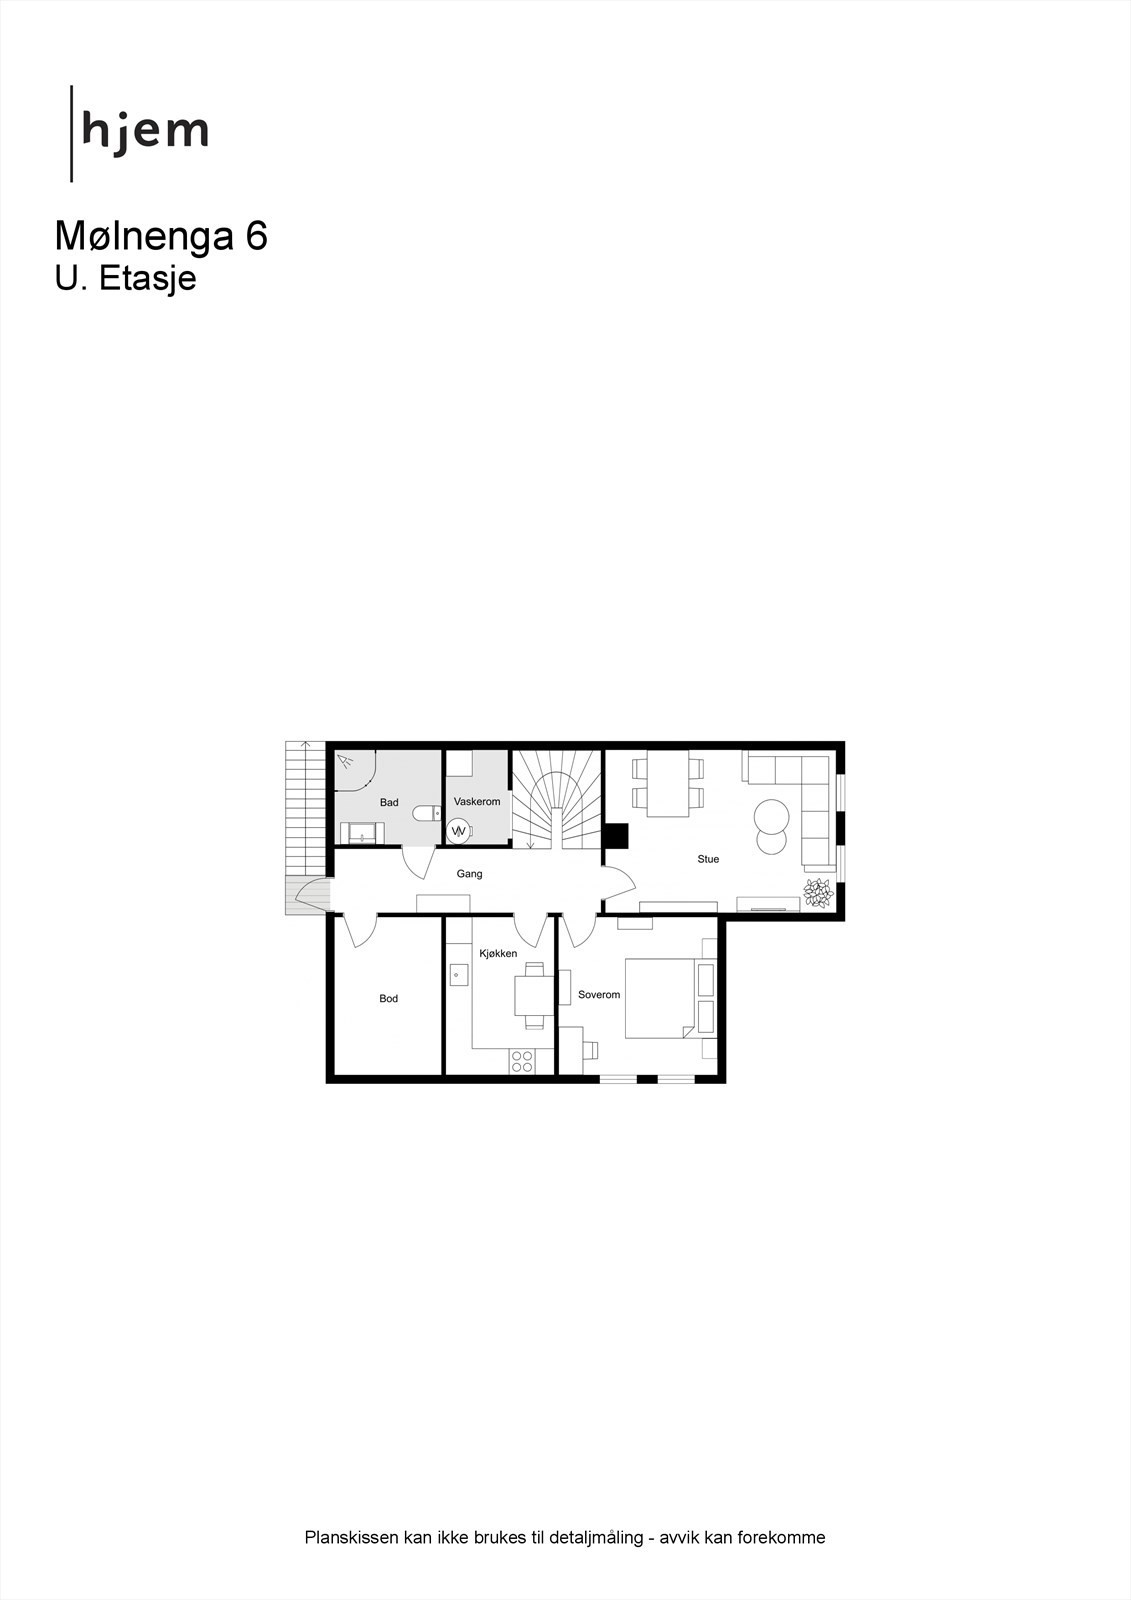 Mølnenga 6 - 2D - U. Etasje - Letterhead.jpg